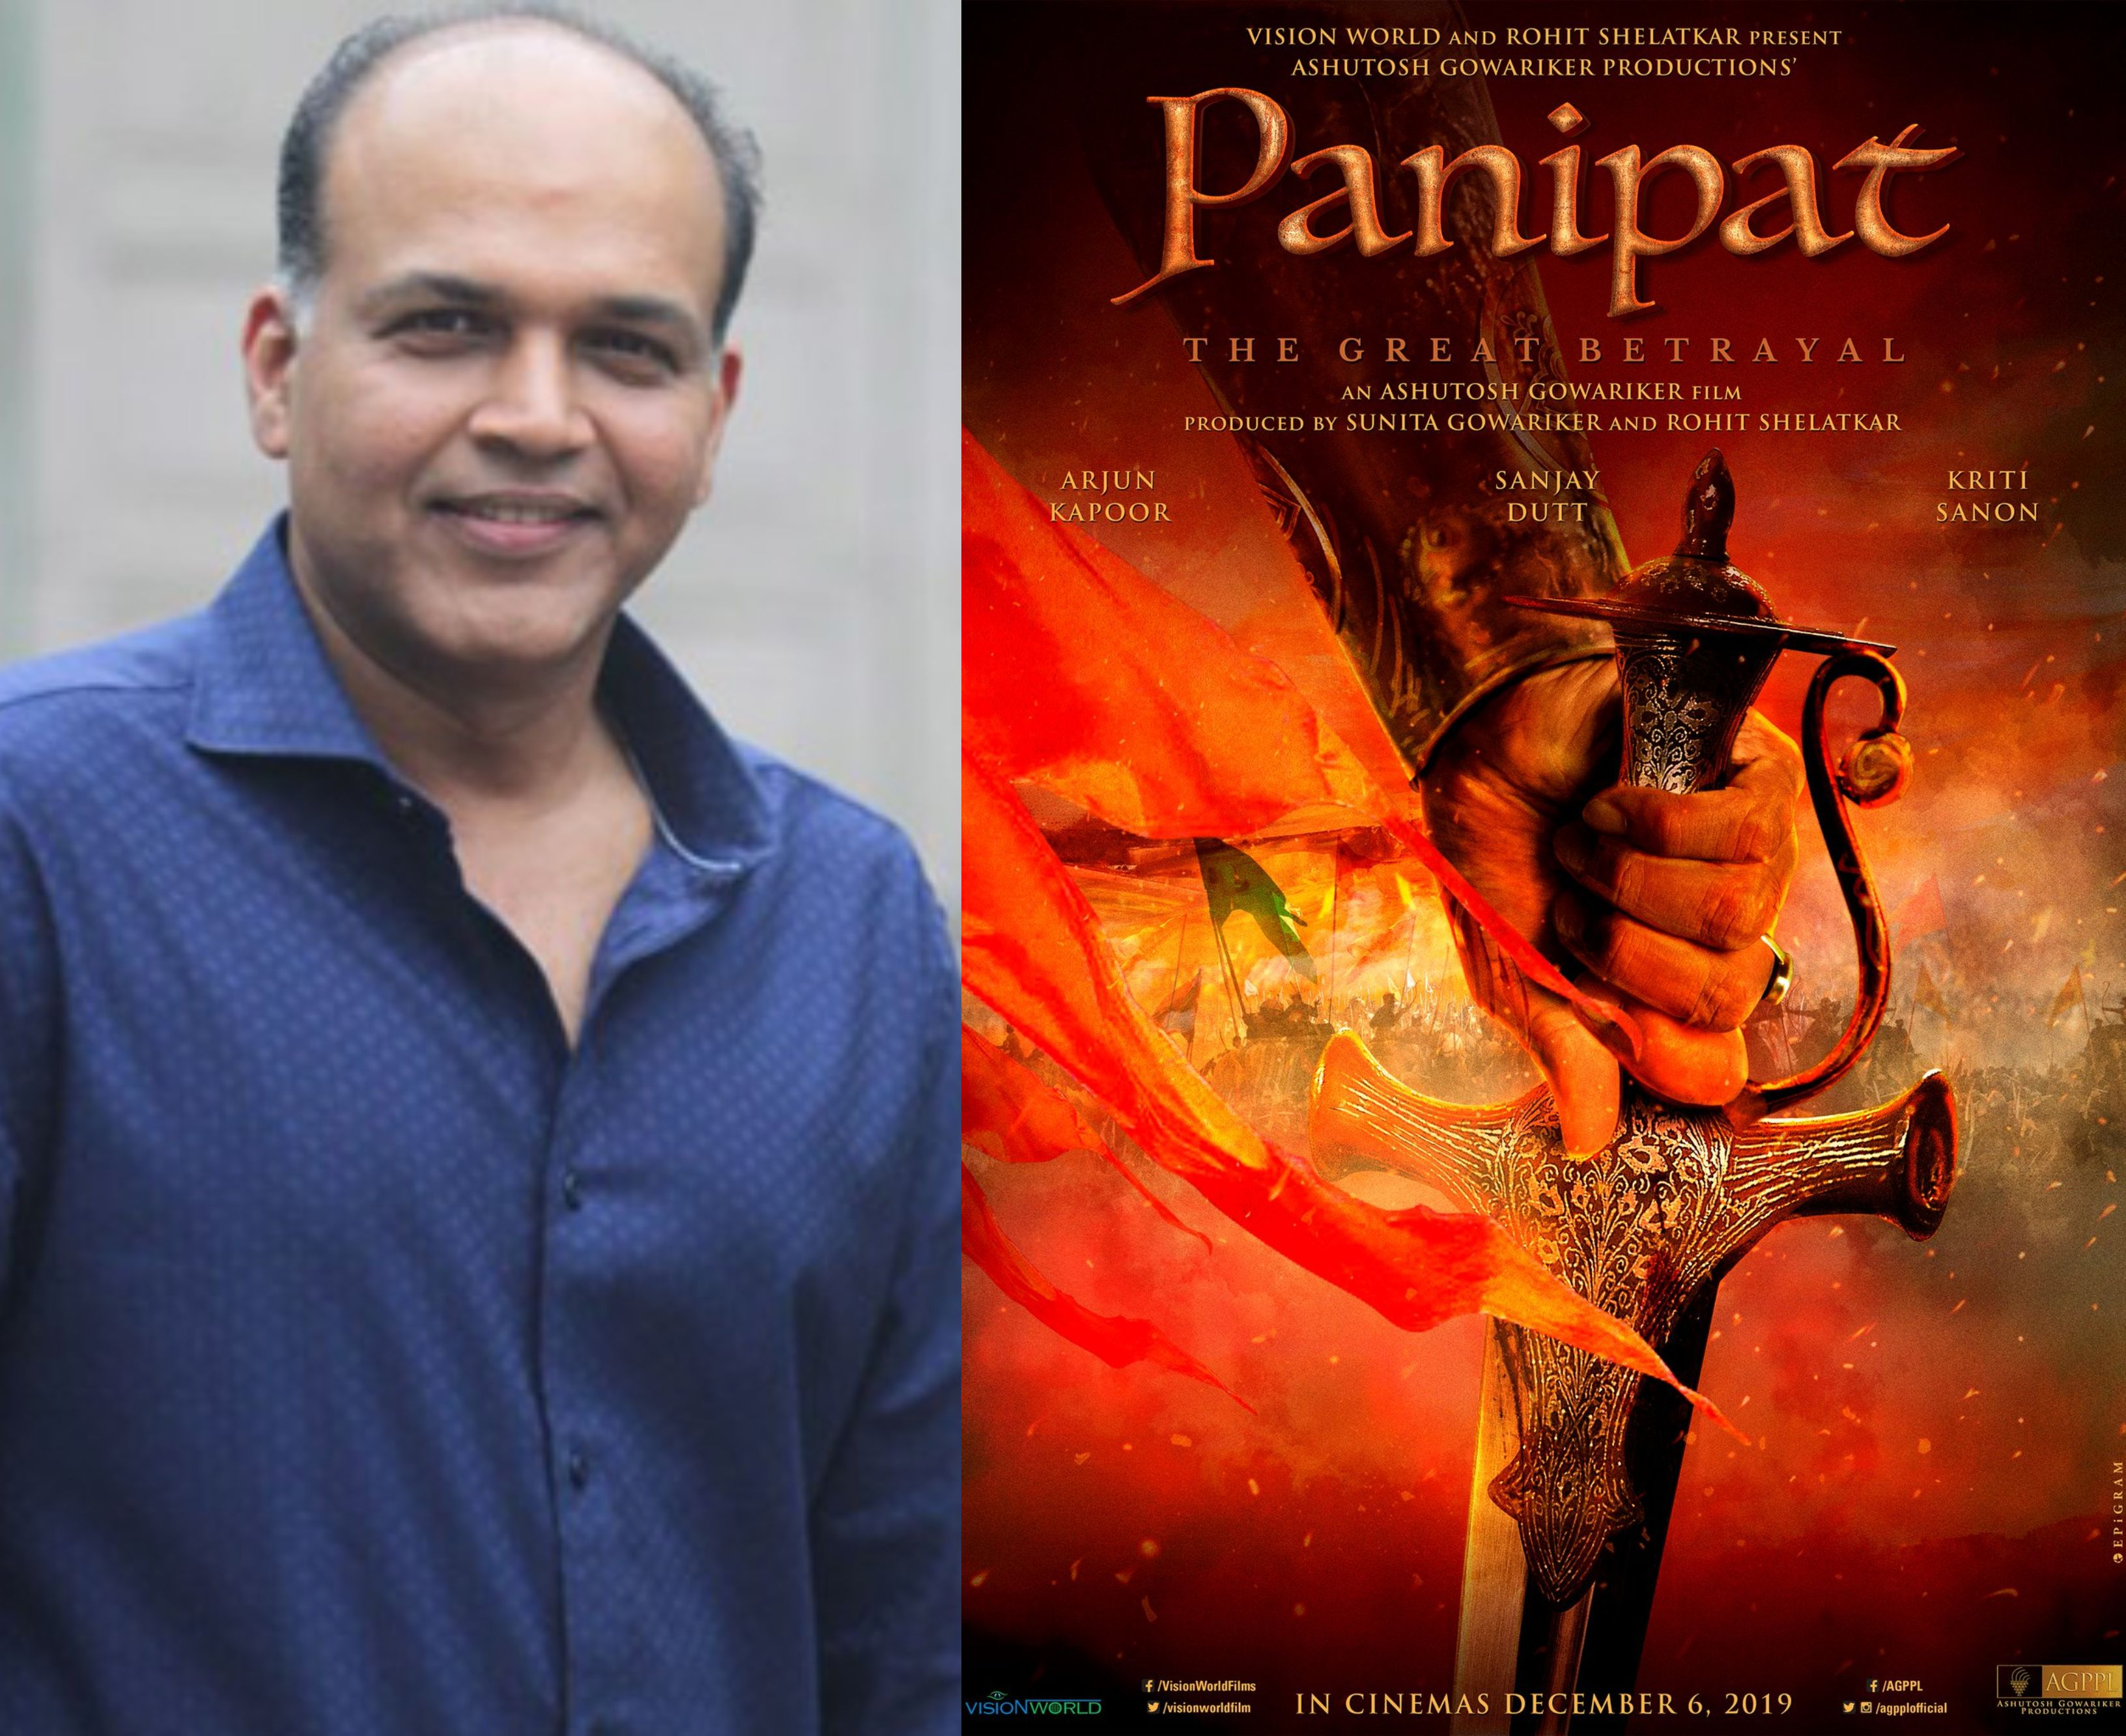 Ashutosh Gowariker's Panipat